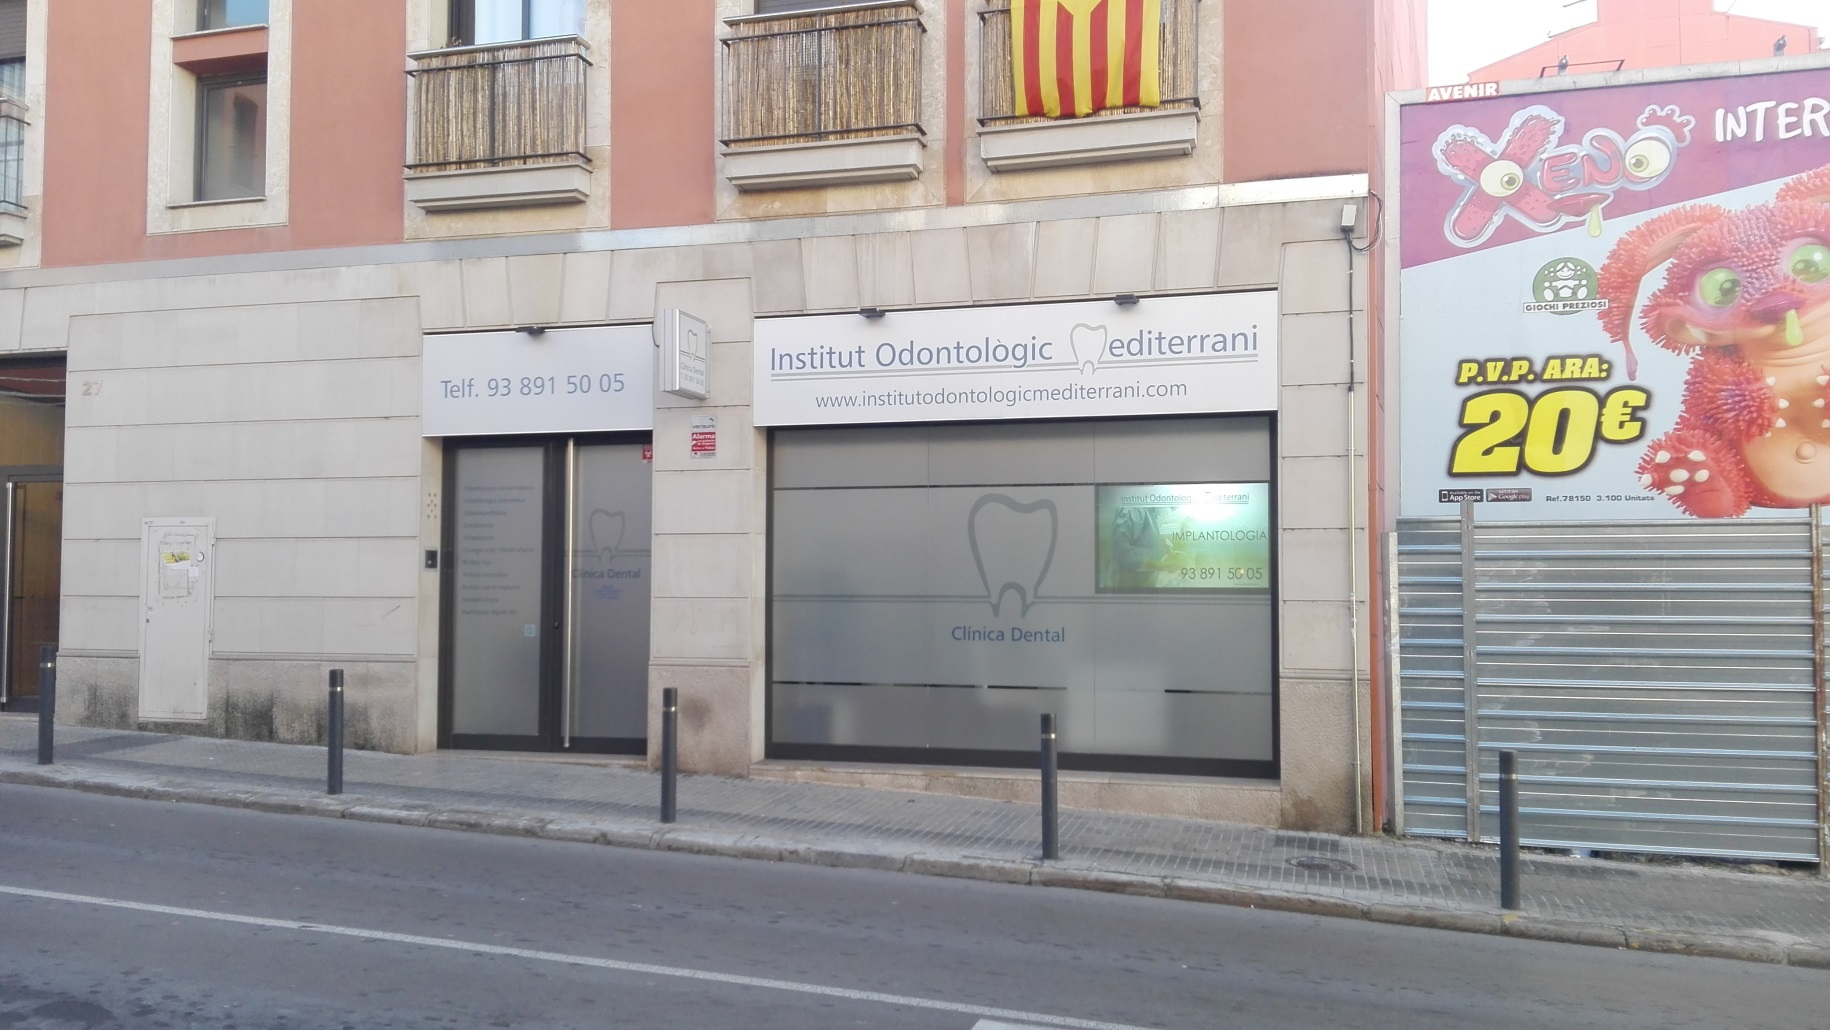 Instituto Odontgológico Mediterraneo